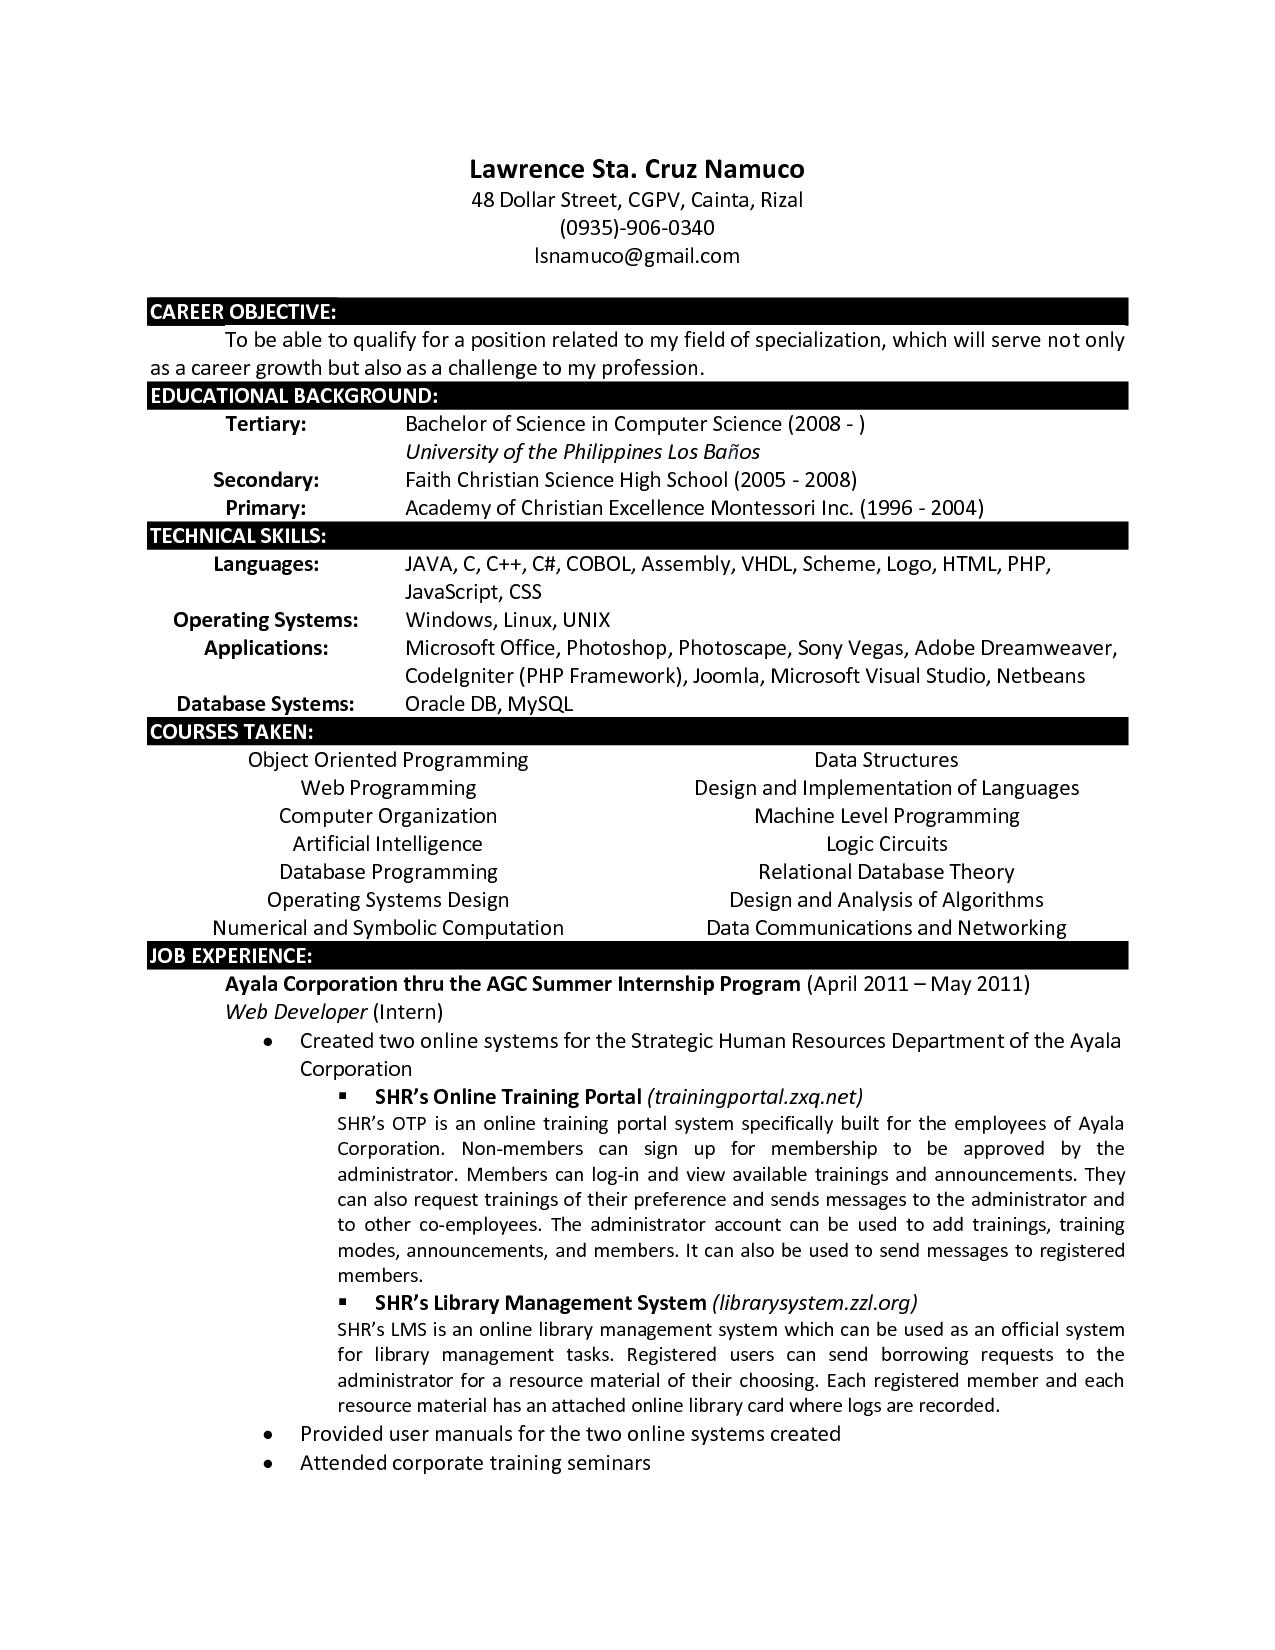 Computer Science Computer science, Internship resume